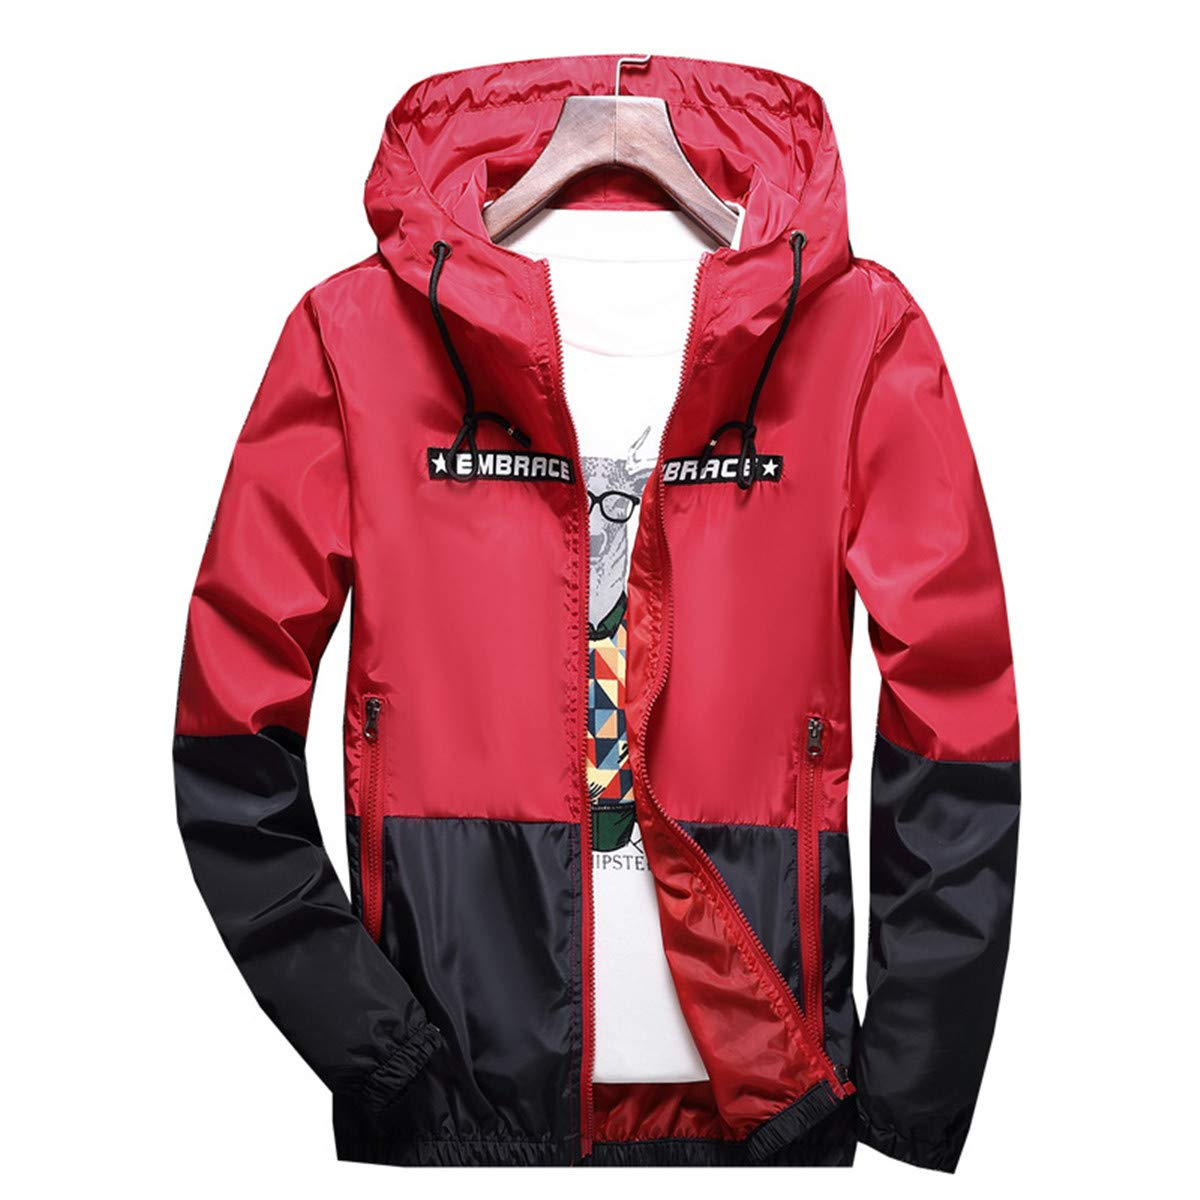 AITFINEISM Men's Lightweight Hooded Zip up Sports Jacket Windproof Windbreaker (Medium, Red) by AITFINEISM